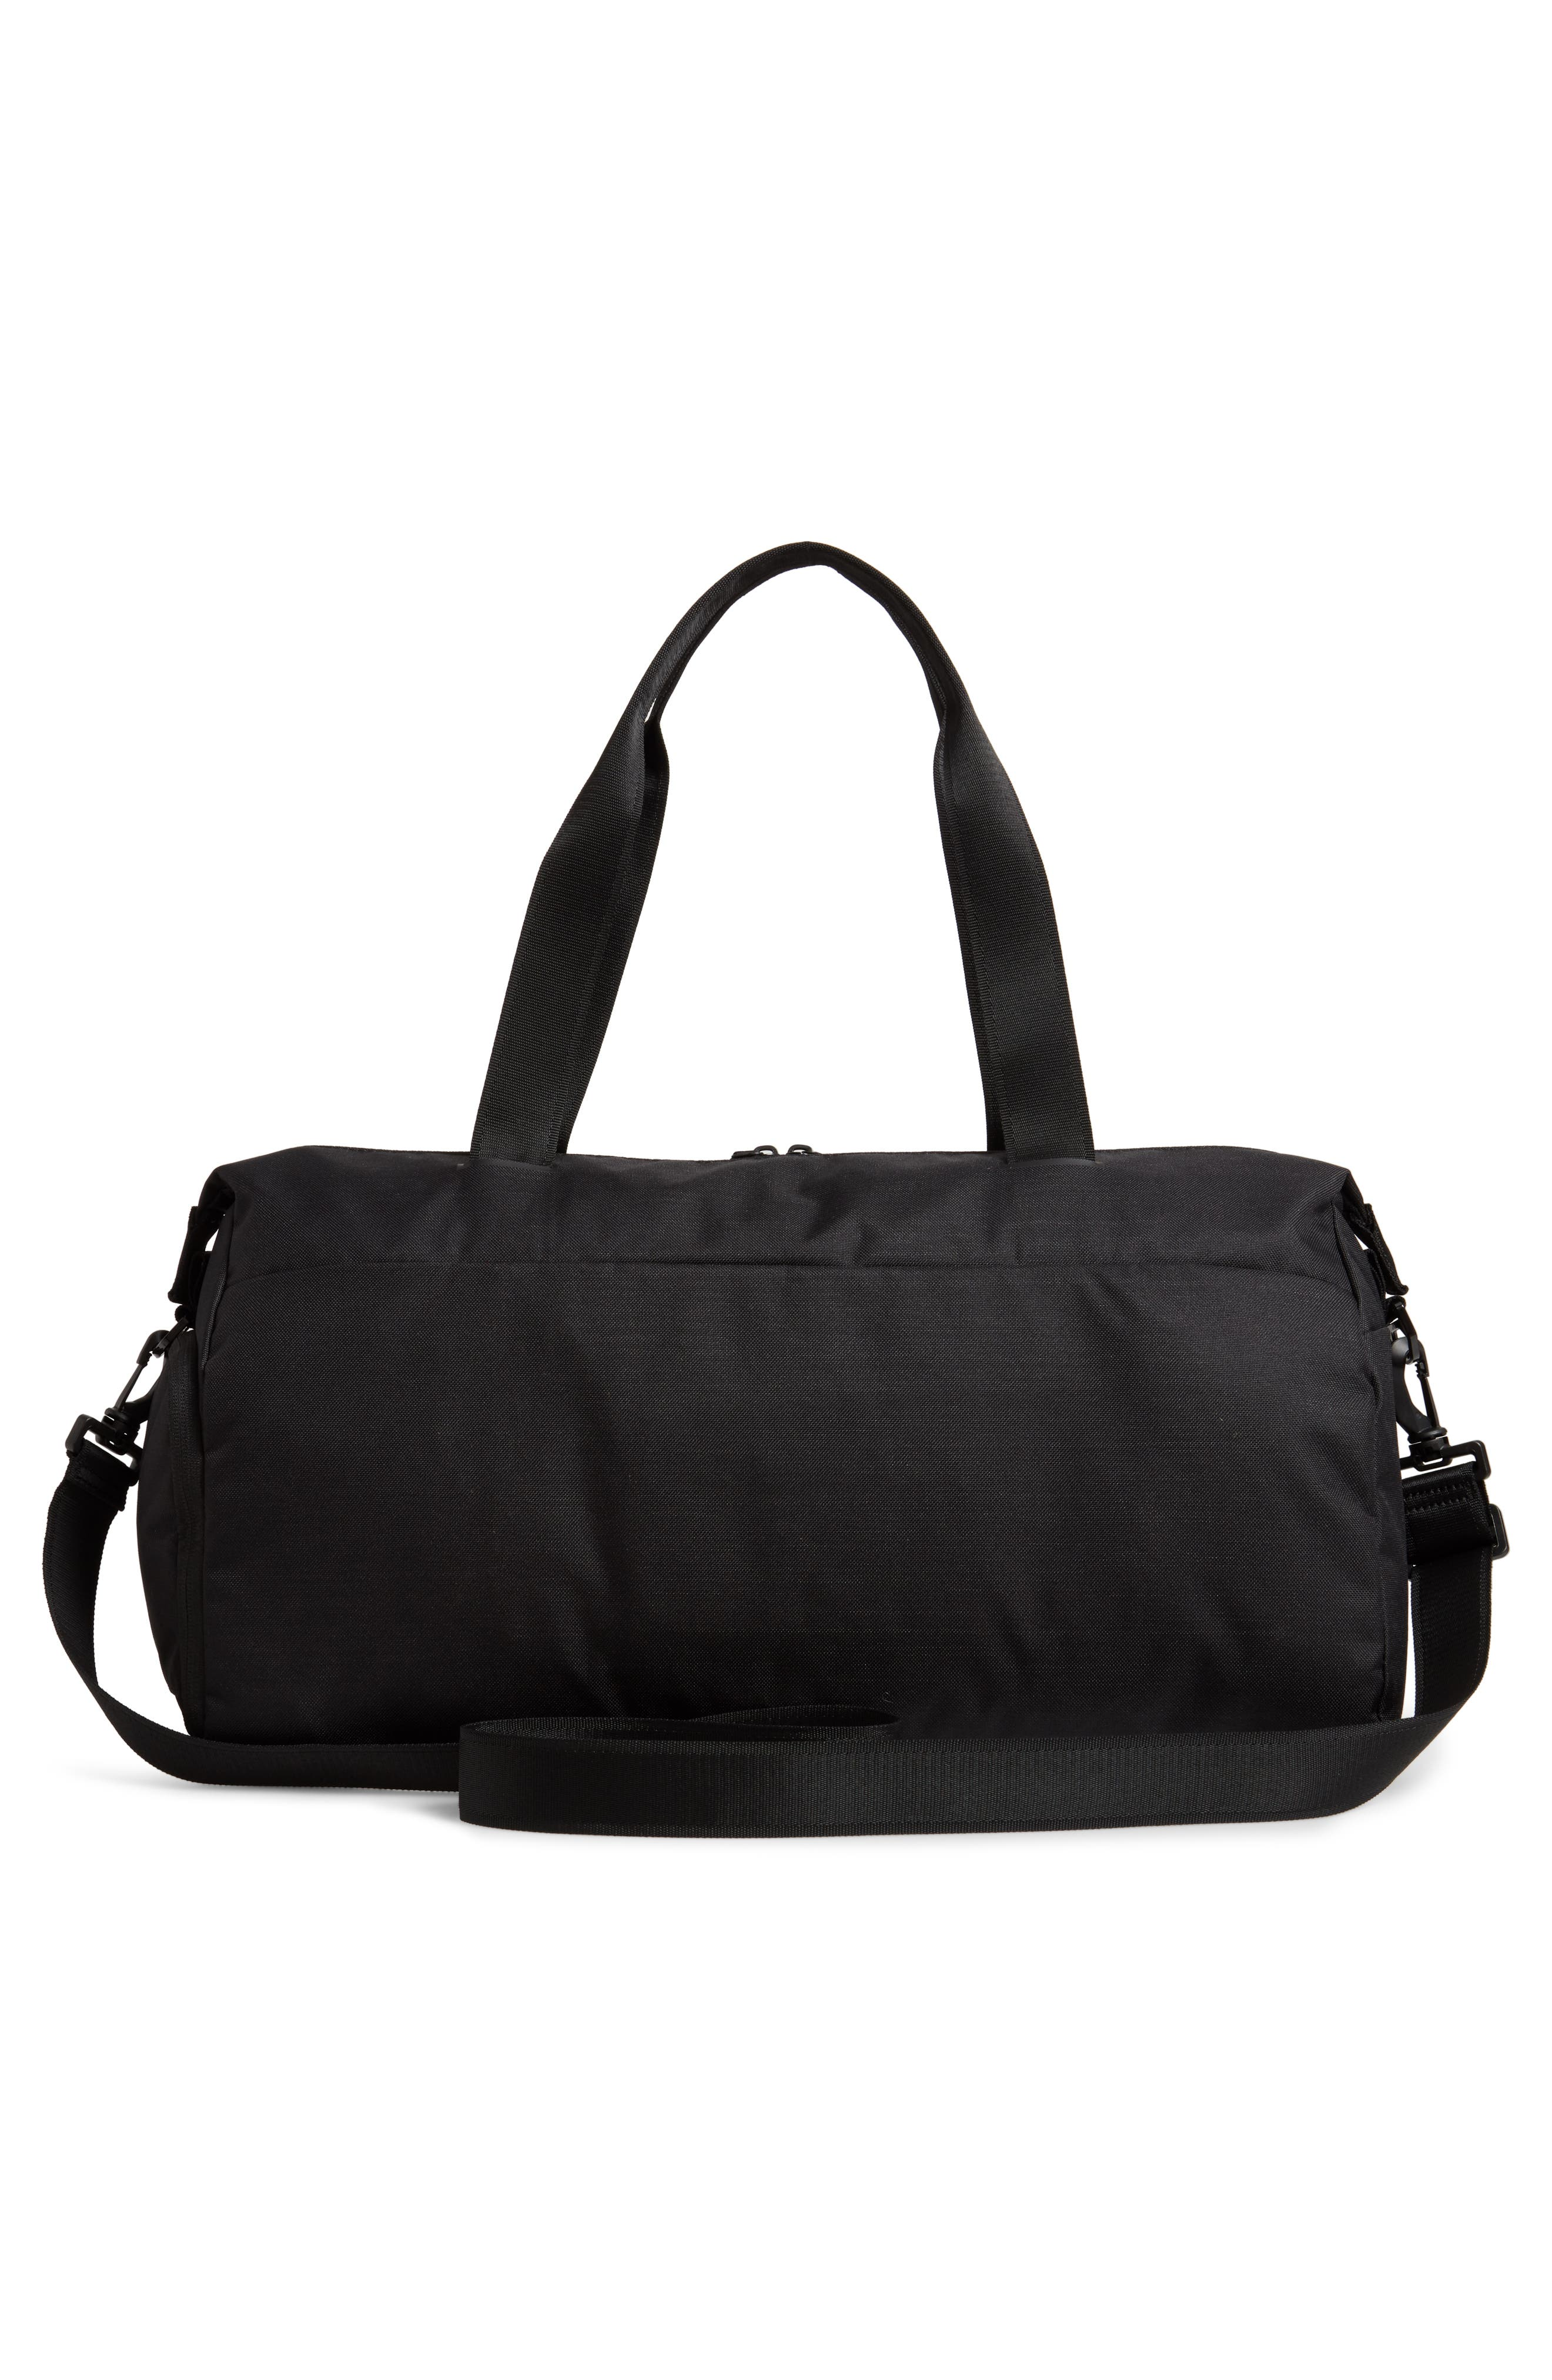 Radiate Club Training Bag,                             Alternate thumbnail 3, color,                             BLACK/ BLACK/ METALLIC GOLD